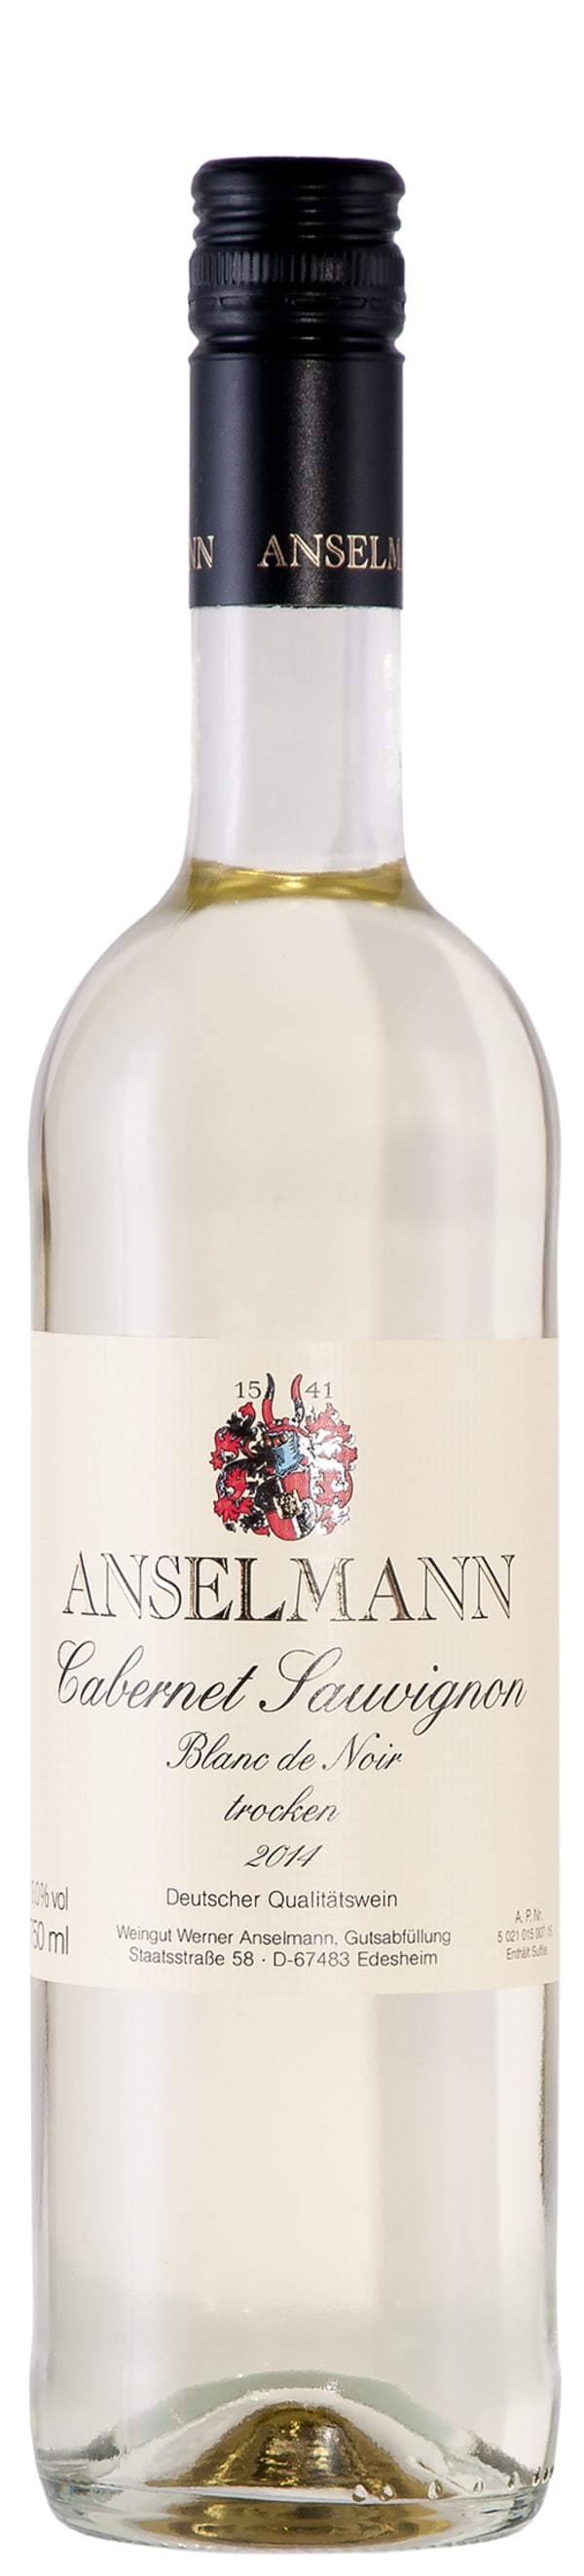 Anselmann Cabernet Sauvignon Blanc de Noir 2016